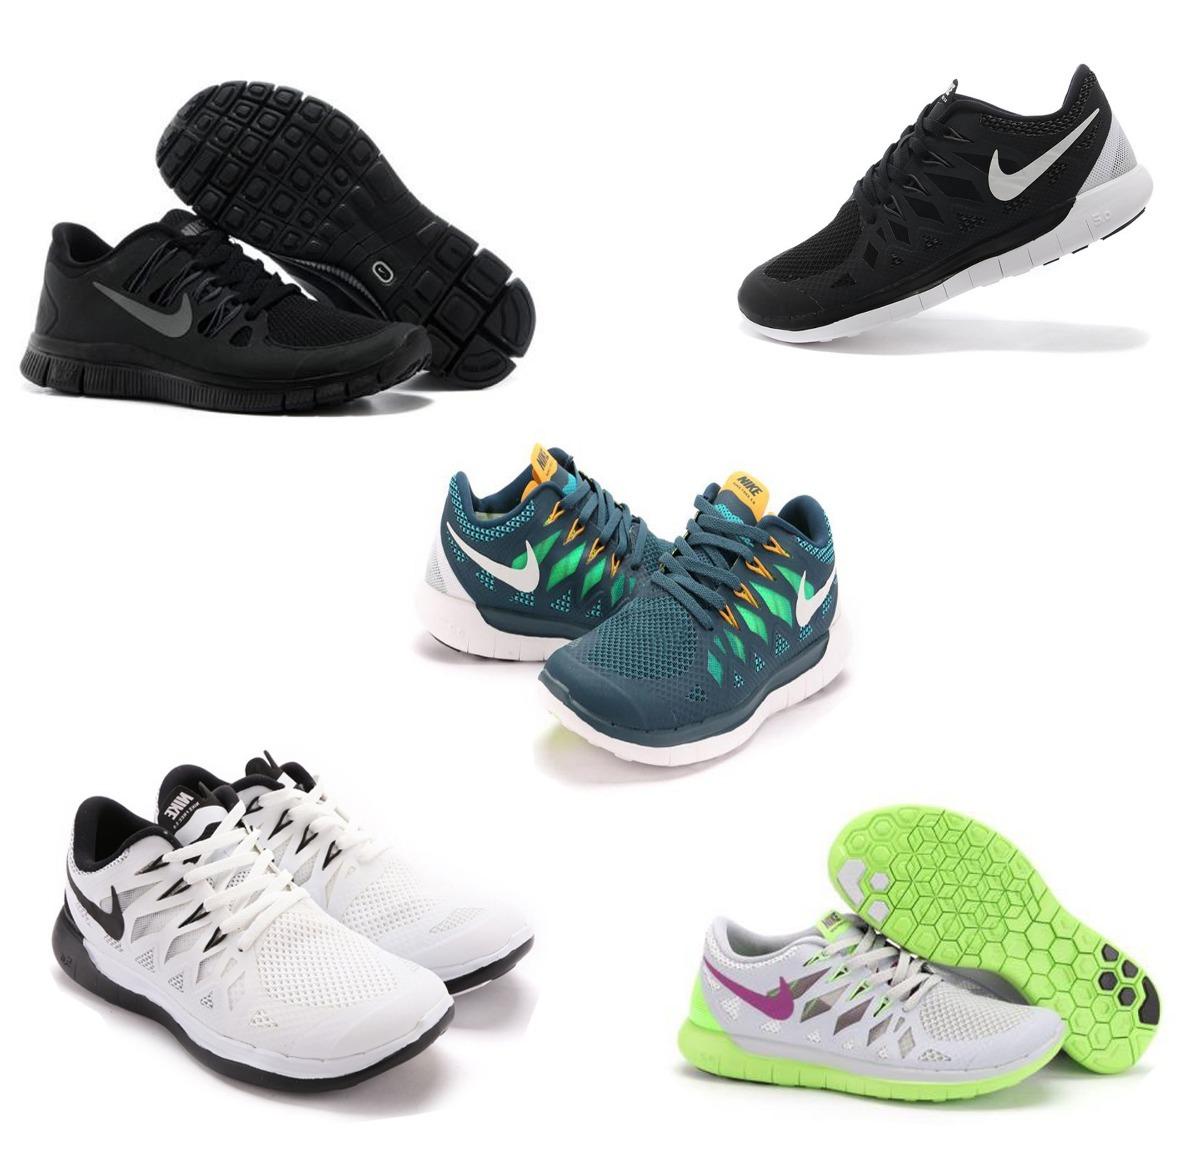 Bs Oferta 0 5 Free Nike Zapatos Caballero Dama Originales 7x8H7q6w f8953536ad2b6